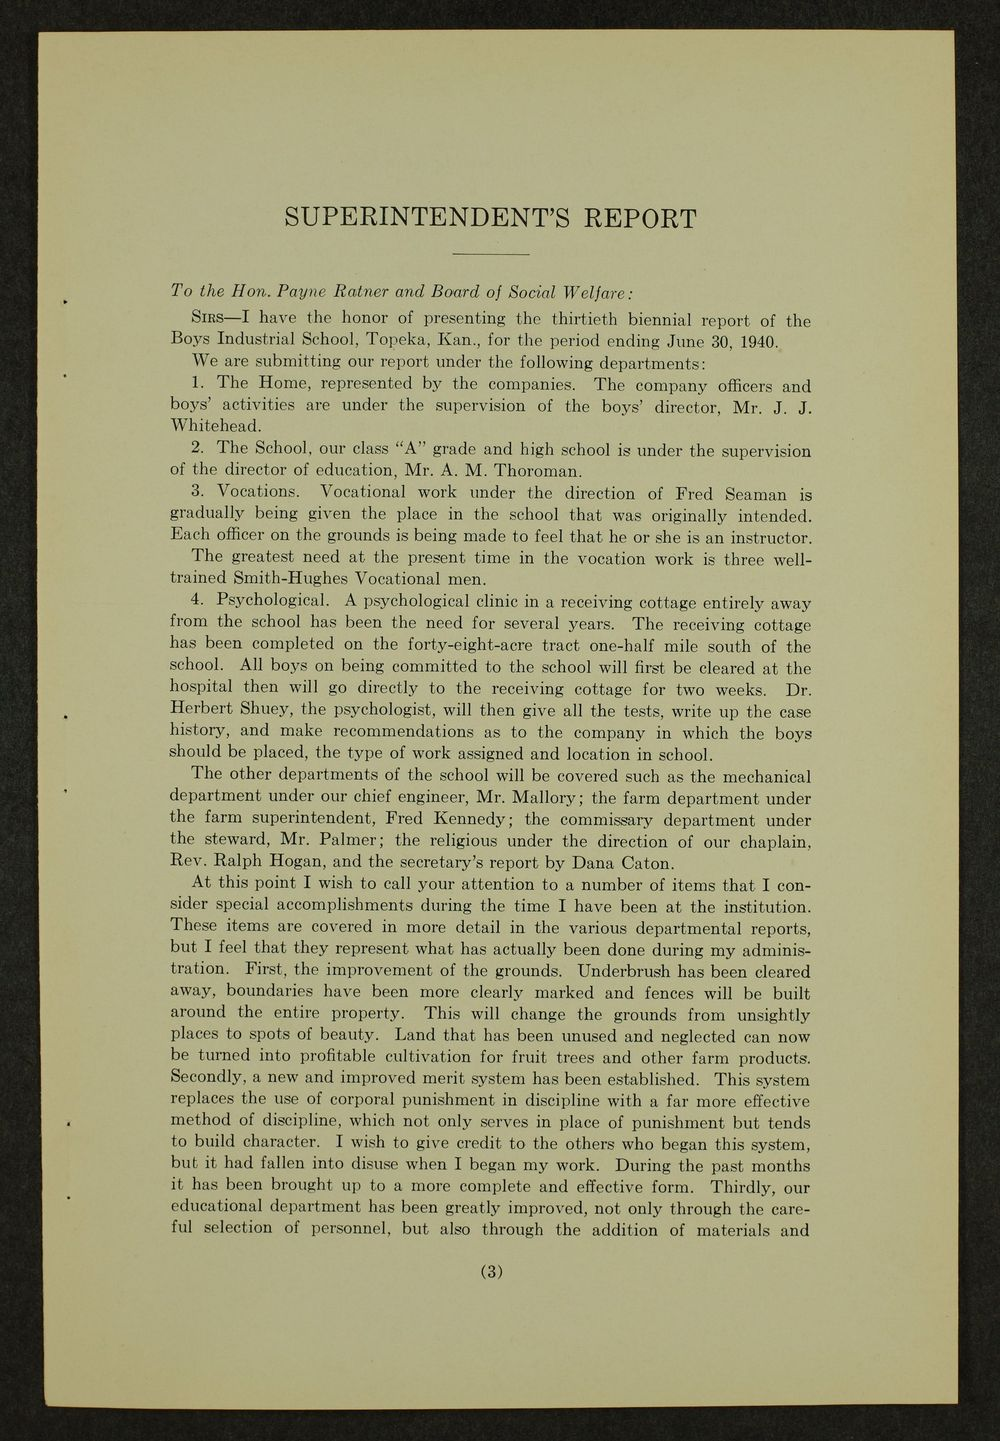 Biennial report of the Boys Industrial School, 1940 - 3